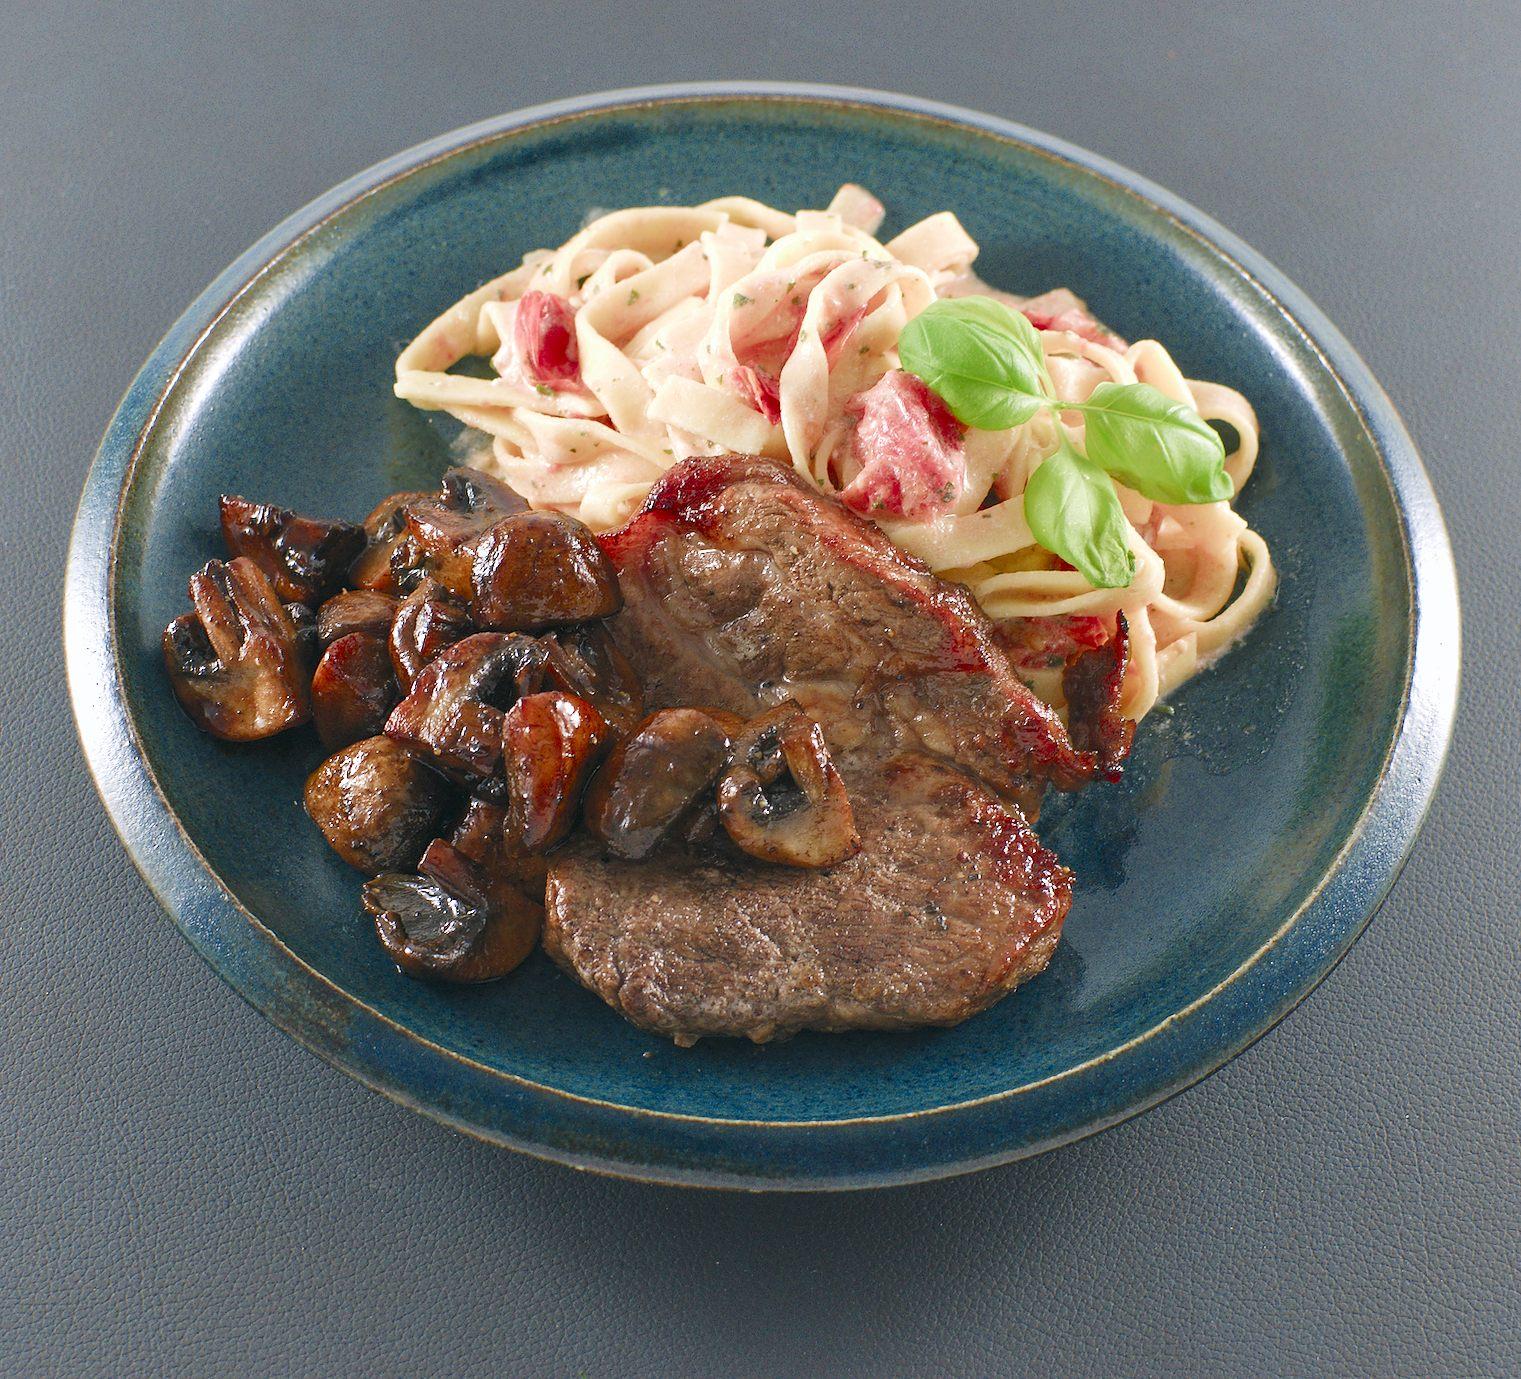 Iberico-Nackensteak | Balsamico-Champignons | Pasta mit Tomaten-Schmand-Sauce